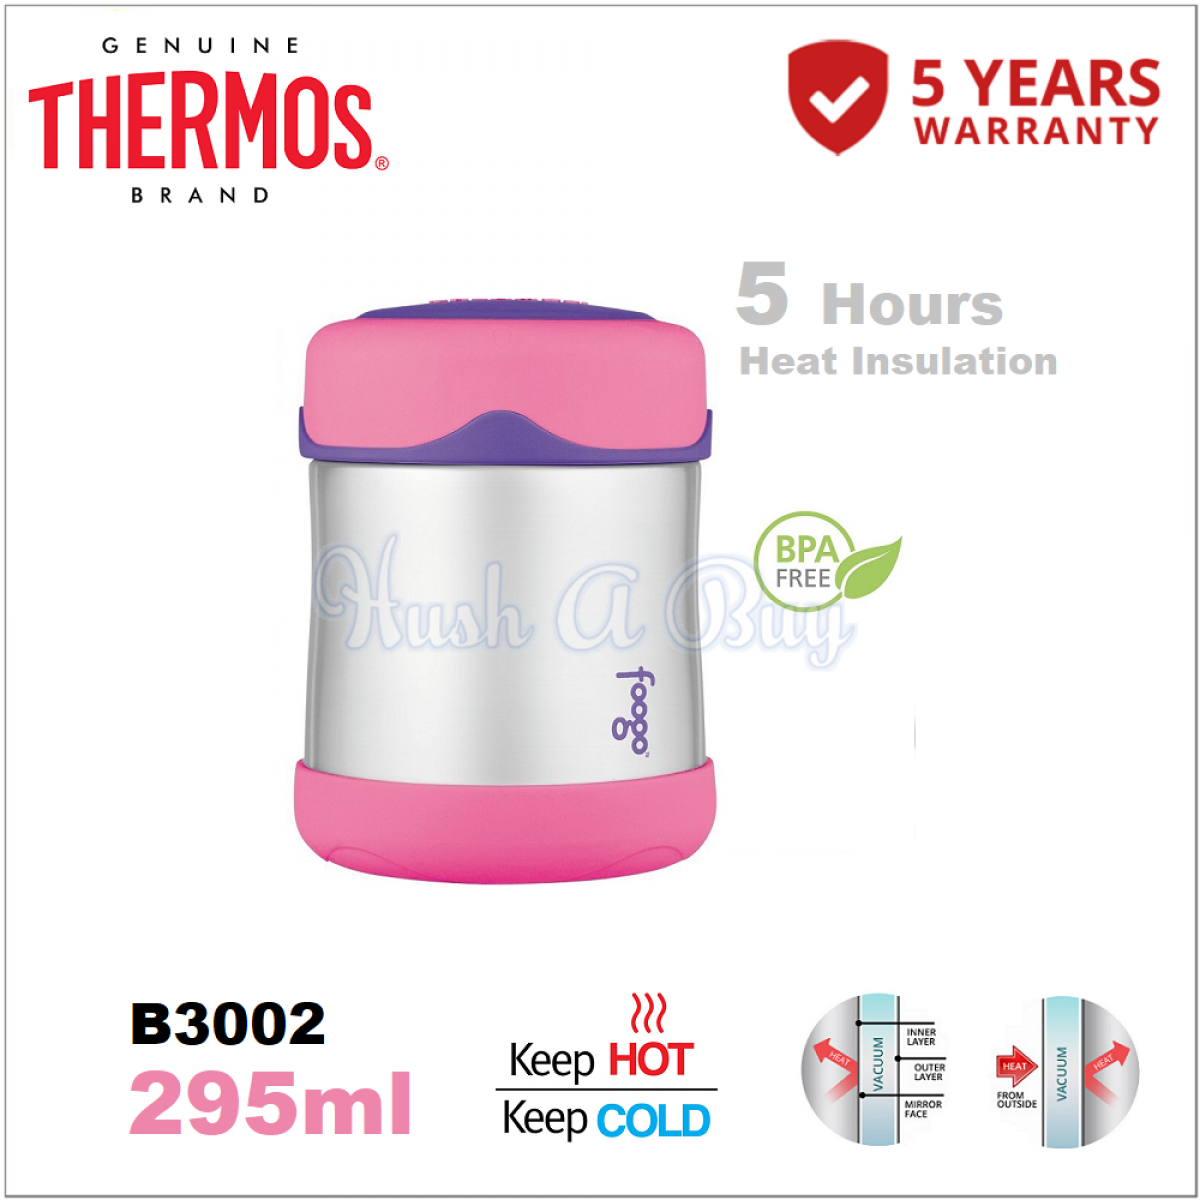 Authentic Thermos Foogo Food Jar 295ml - 5 Years Warranty